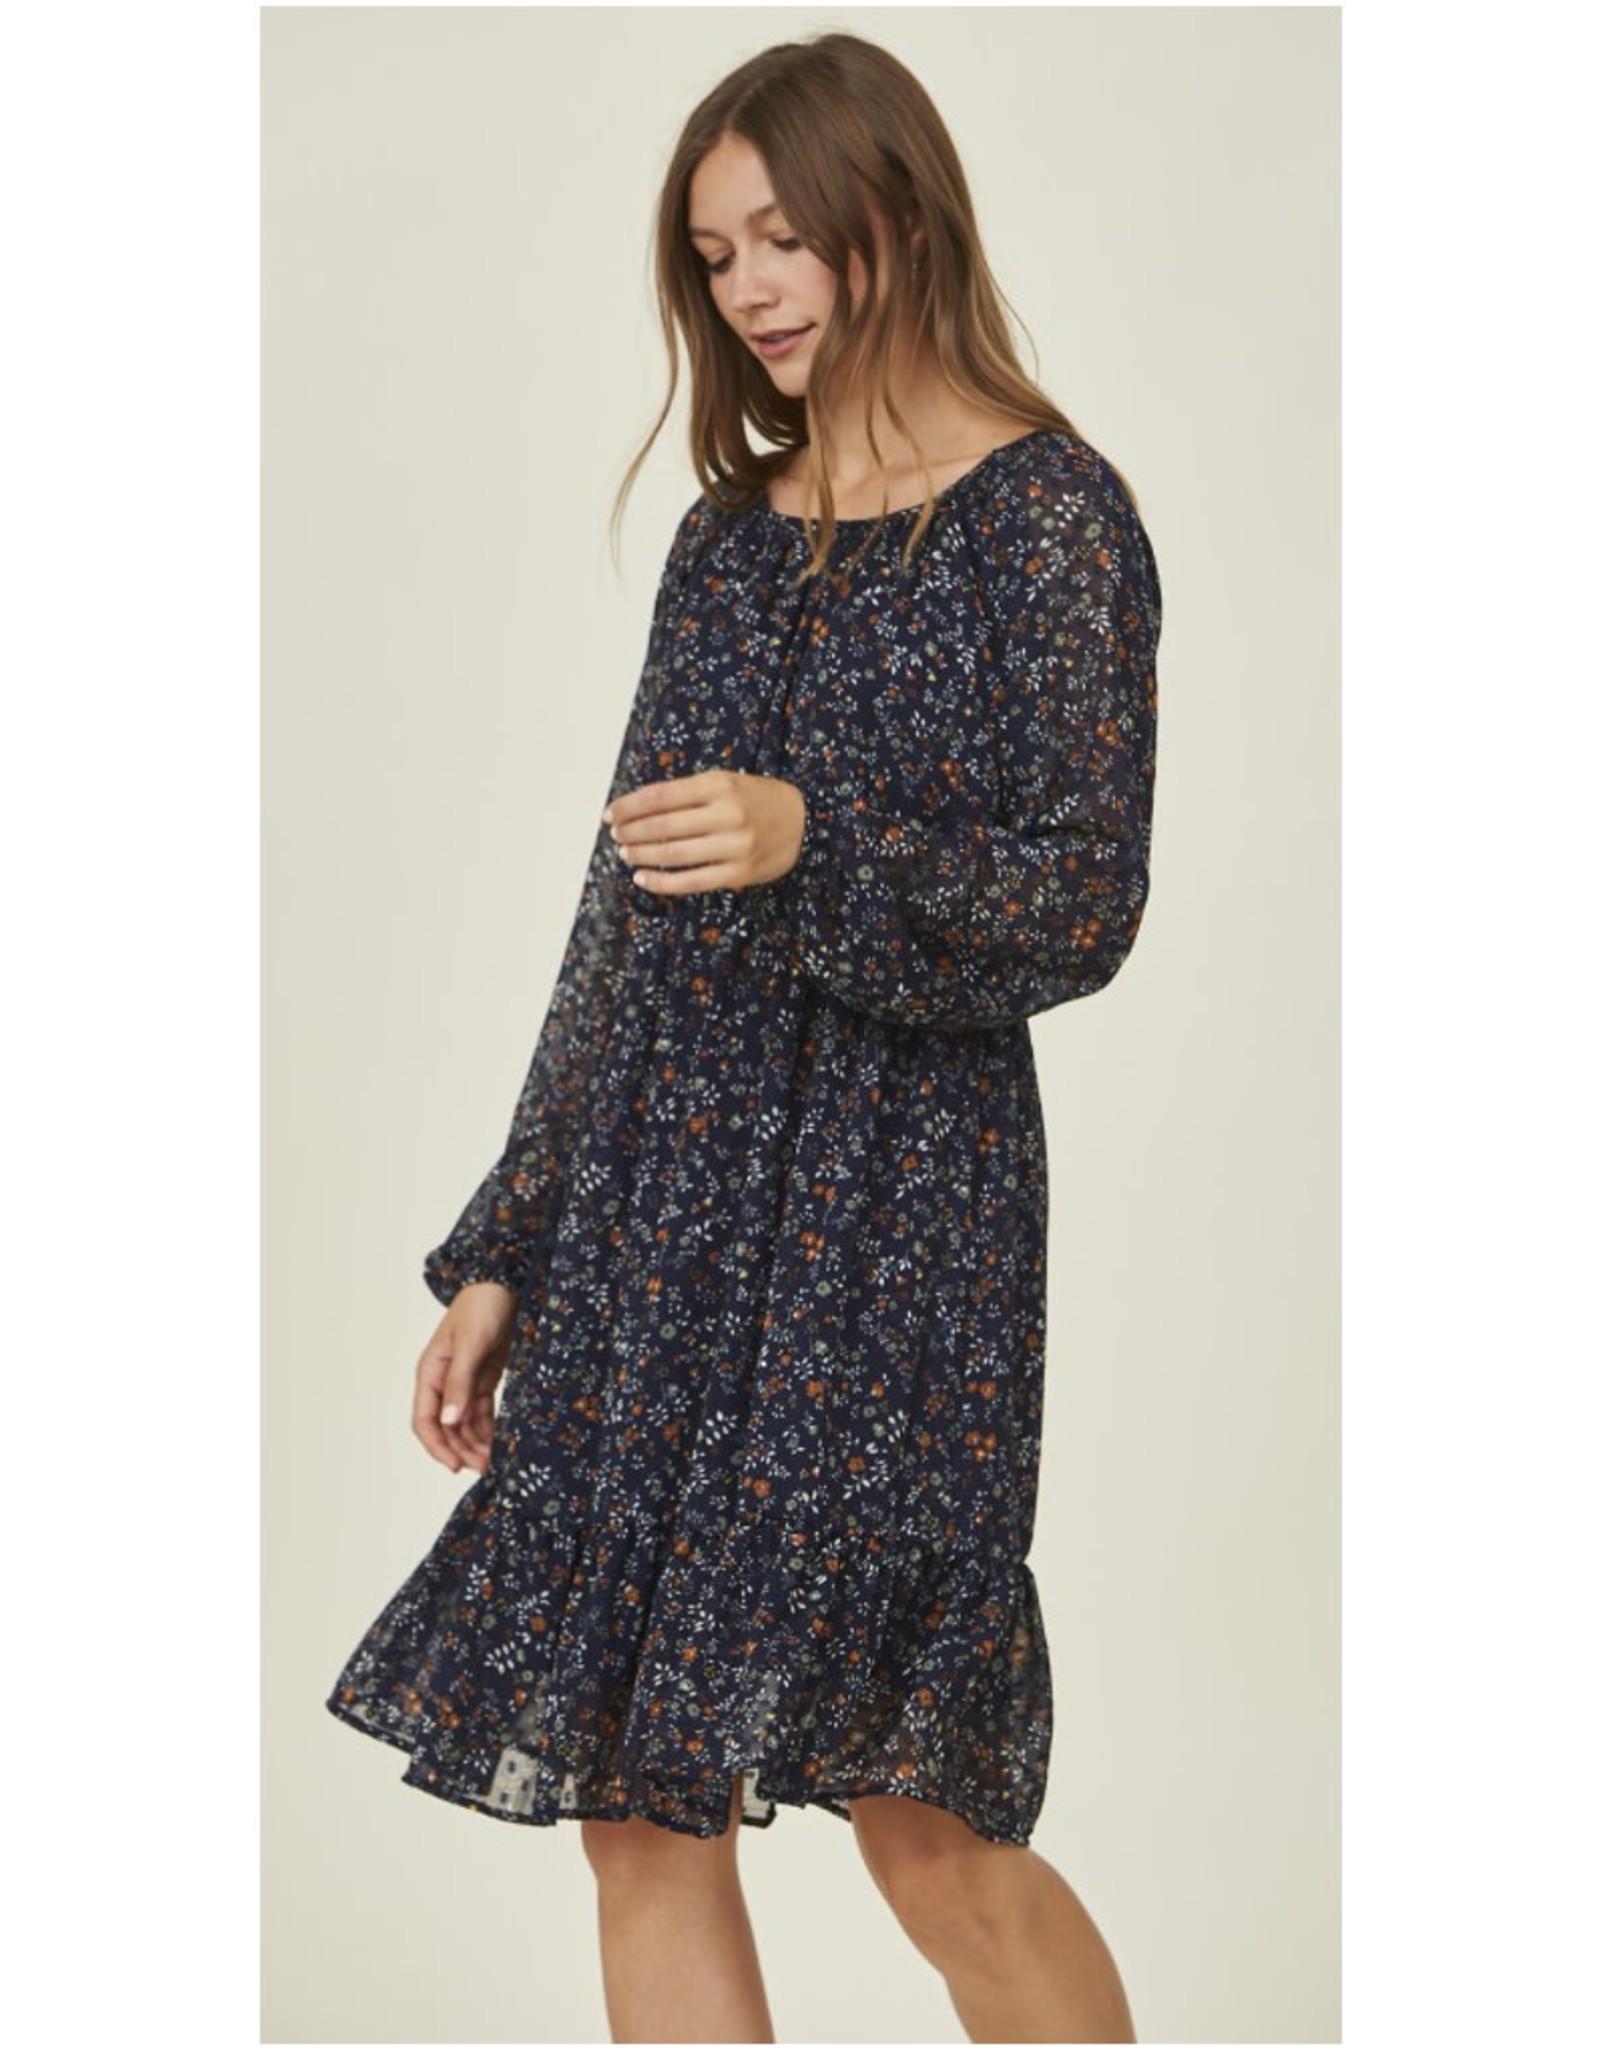 Tiered Ruffle Midi Dress